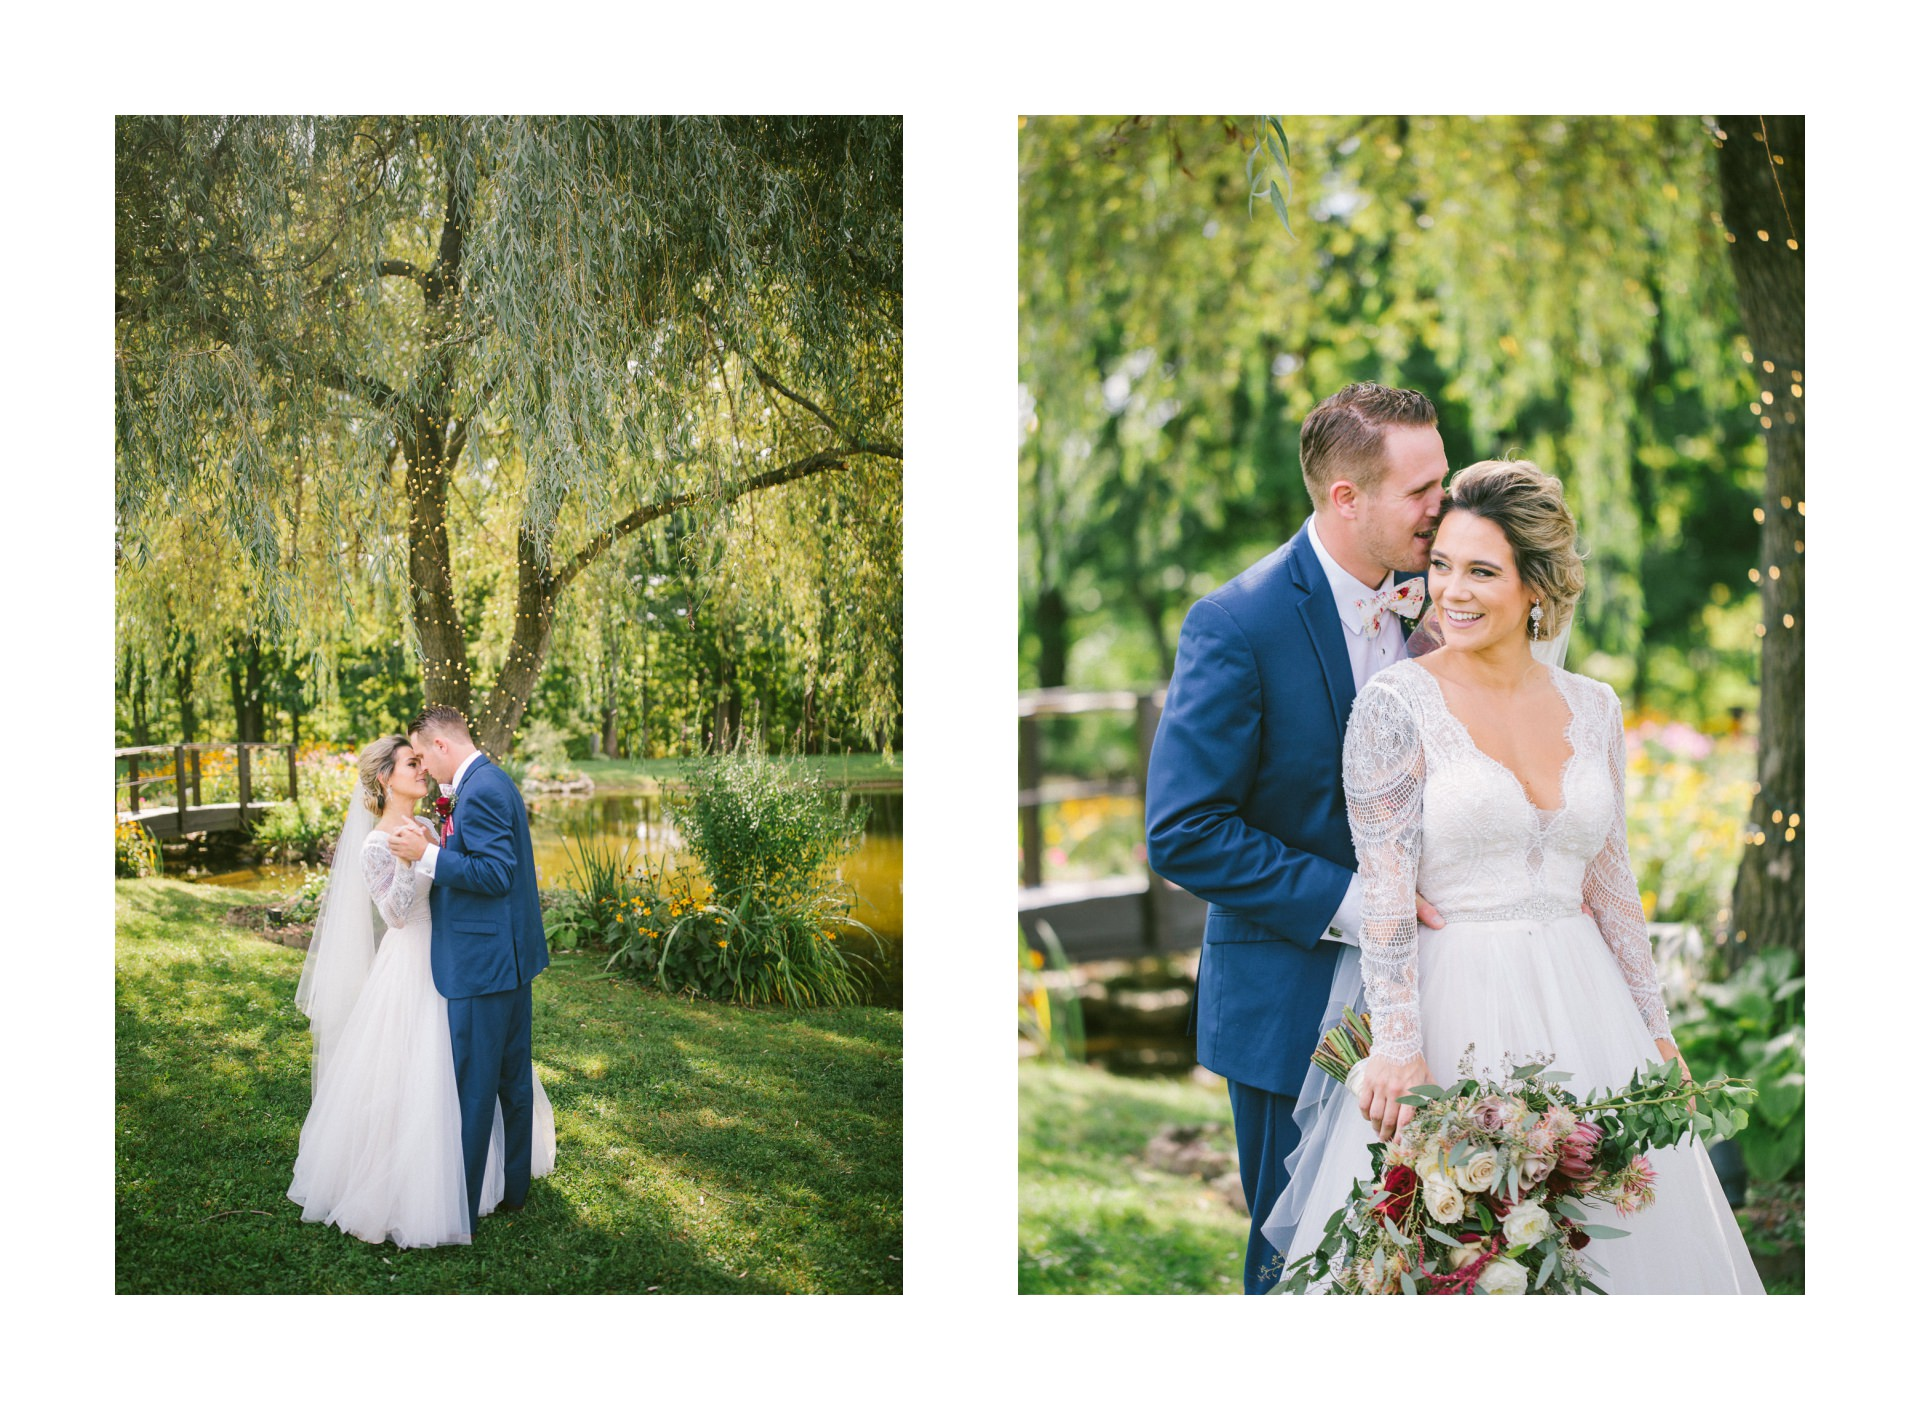 Meadow Ridge Farm Wedding Photos in Windsor 1 48.jpg